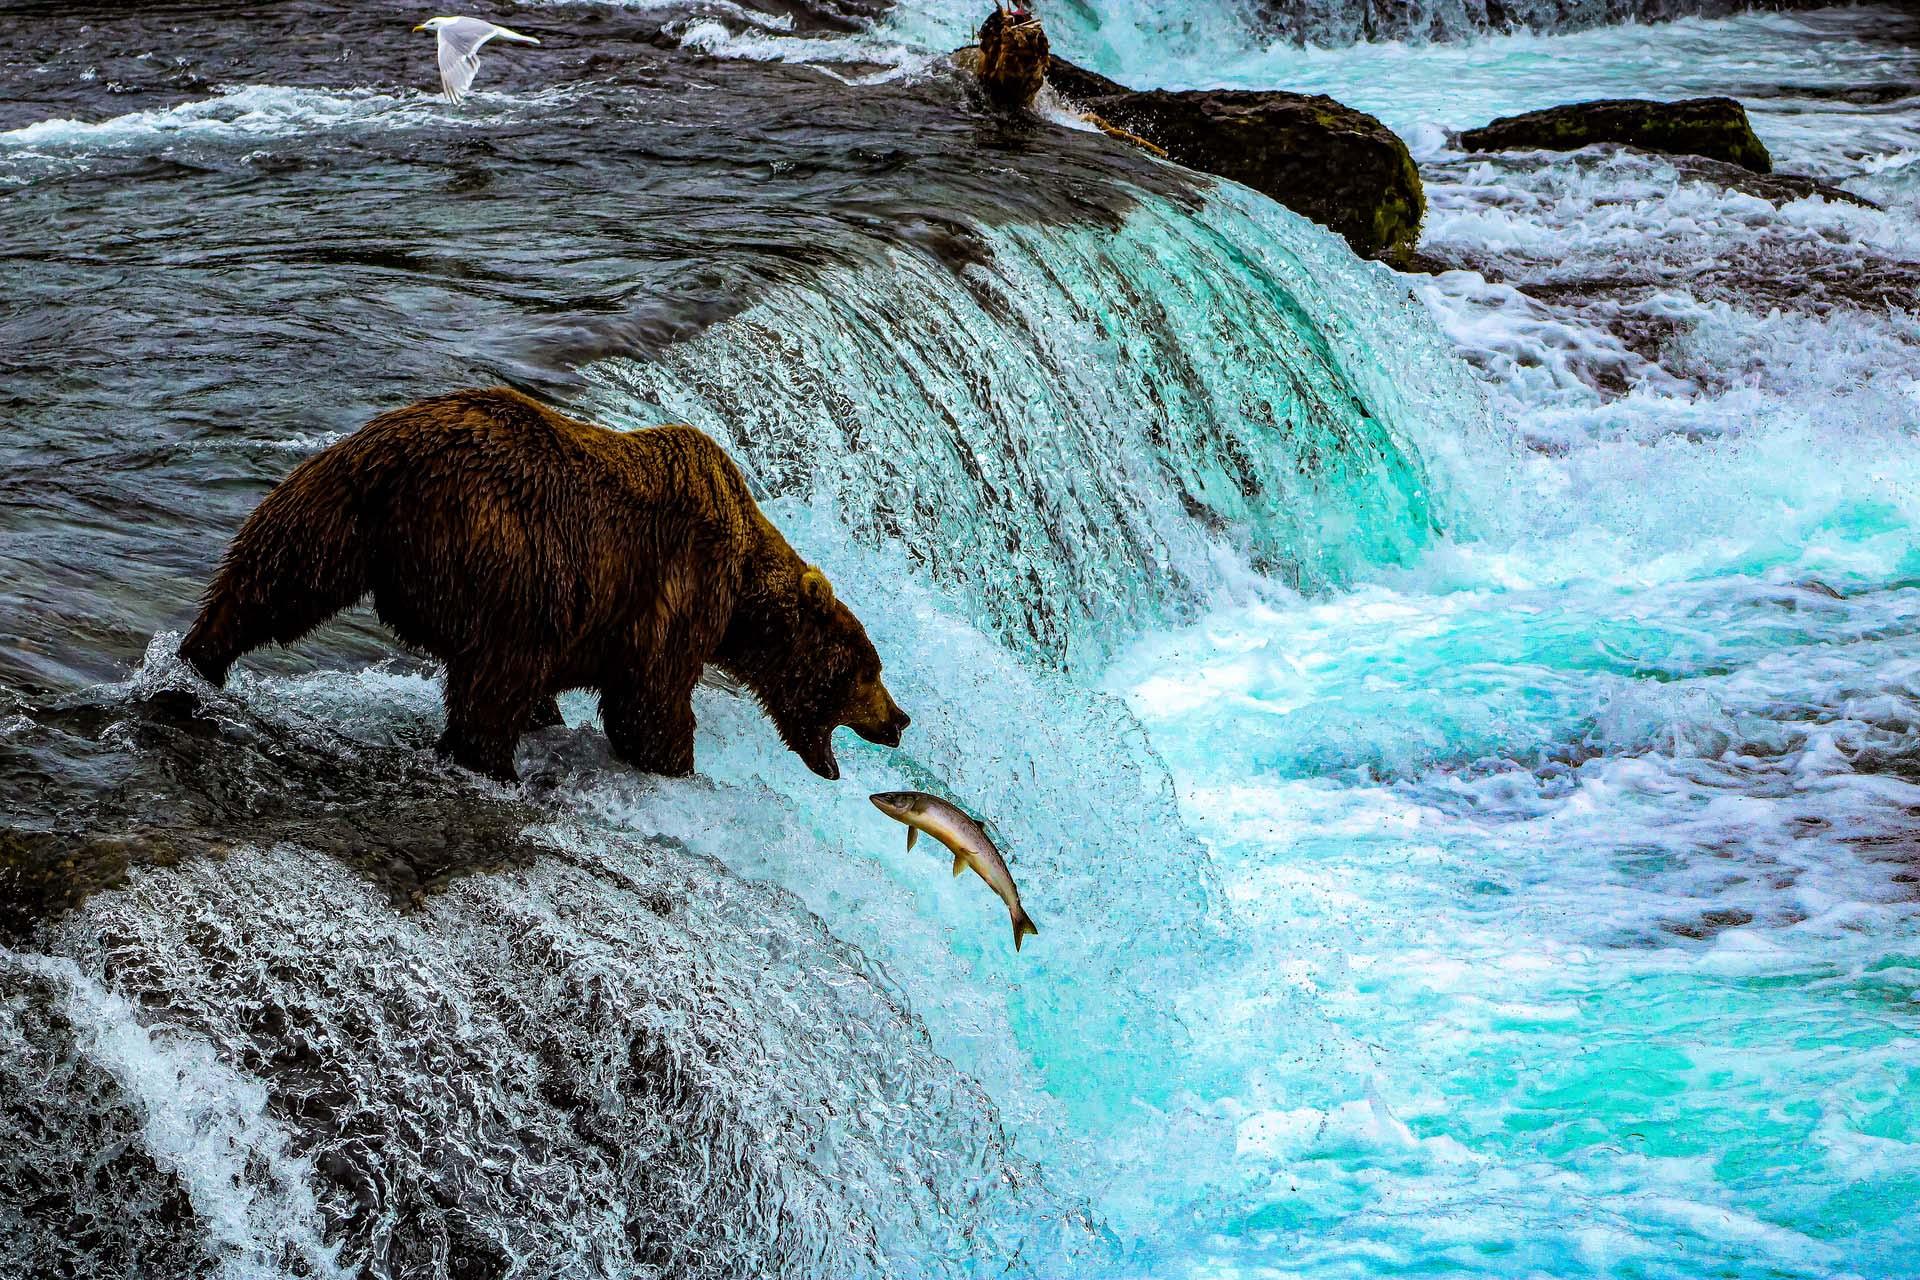 Grizzly at Katmai National Park, King Salmon, Alaska